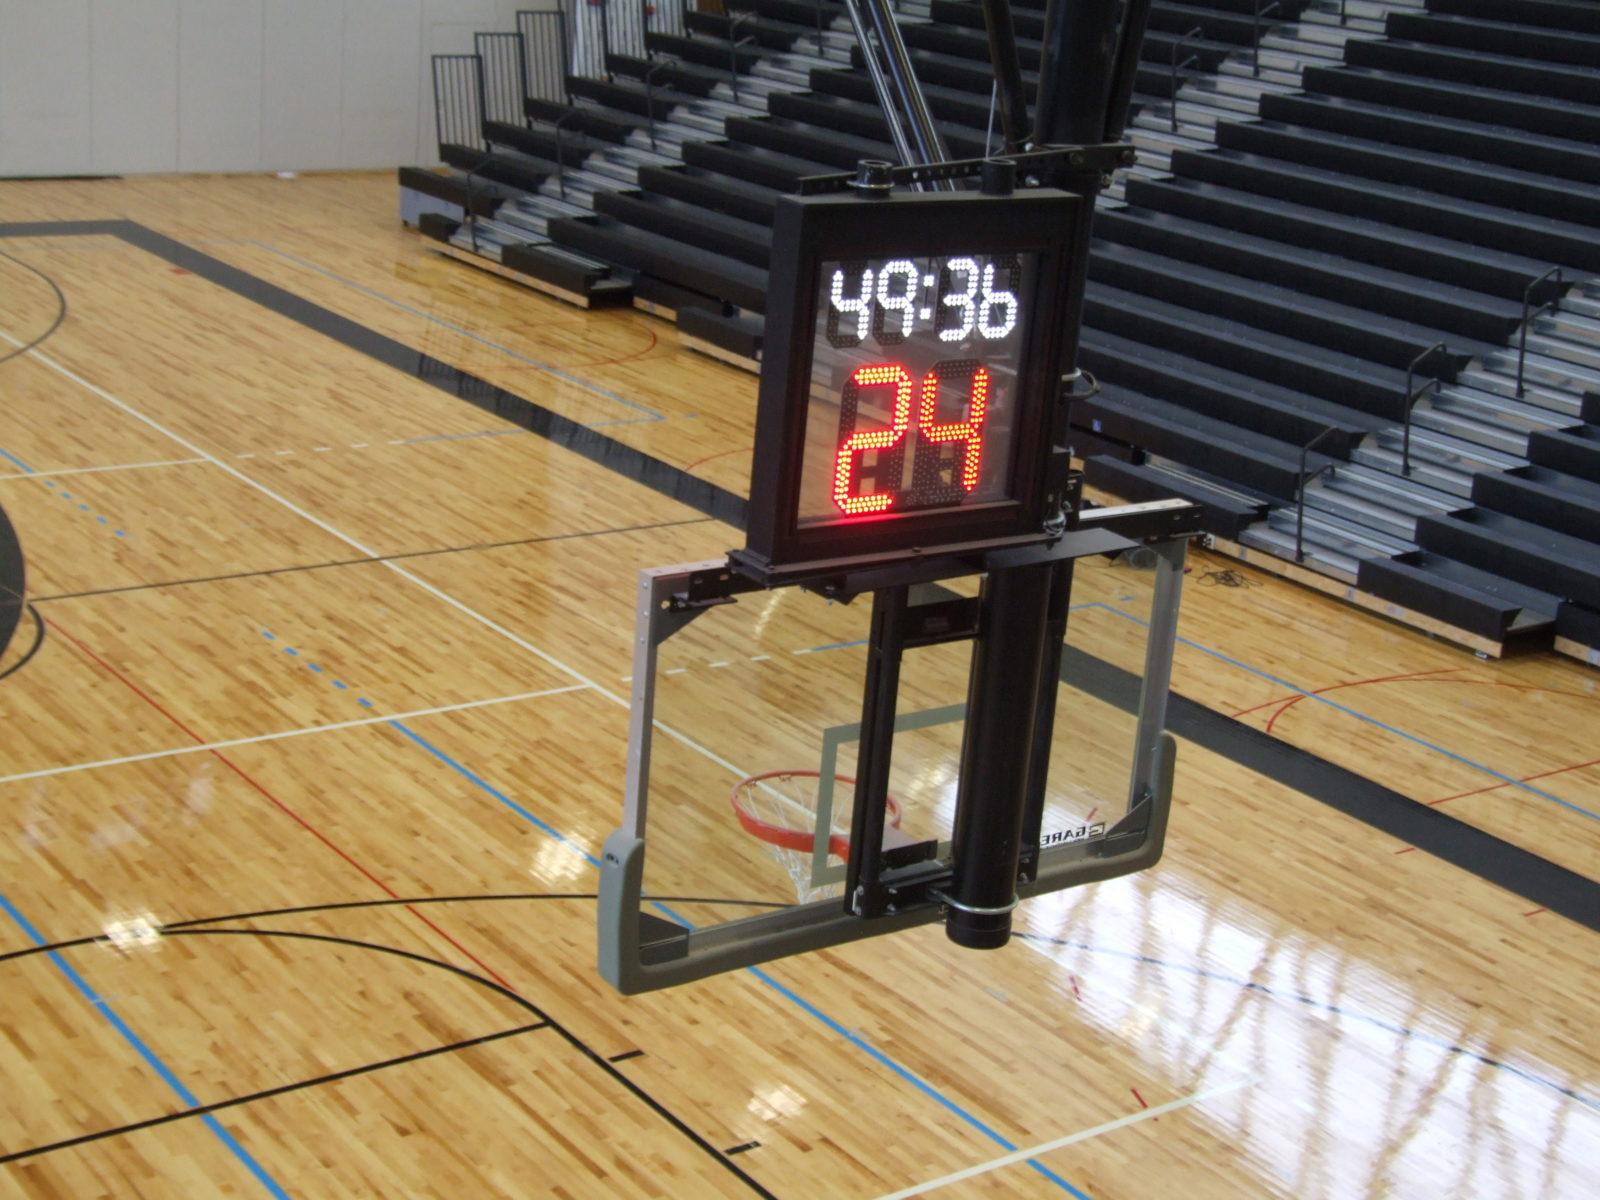 scoreboard and timer over basketball net